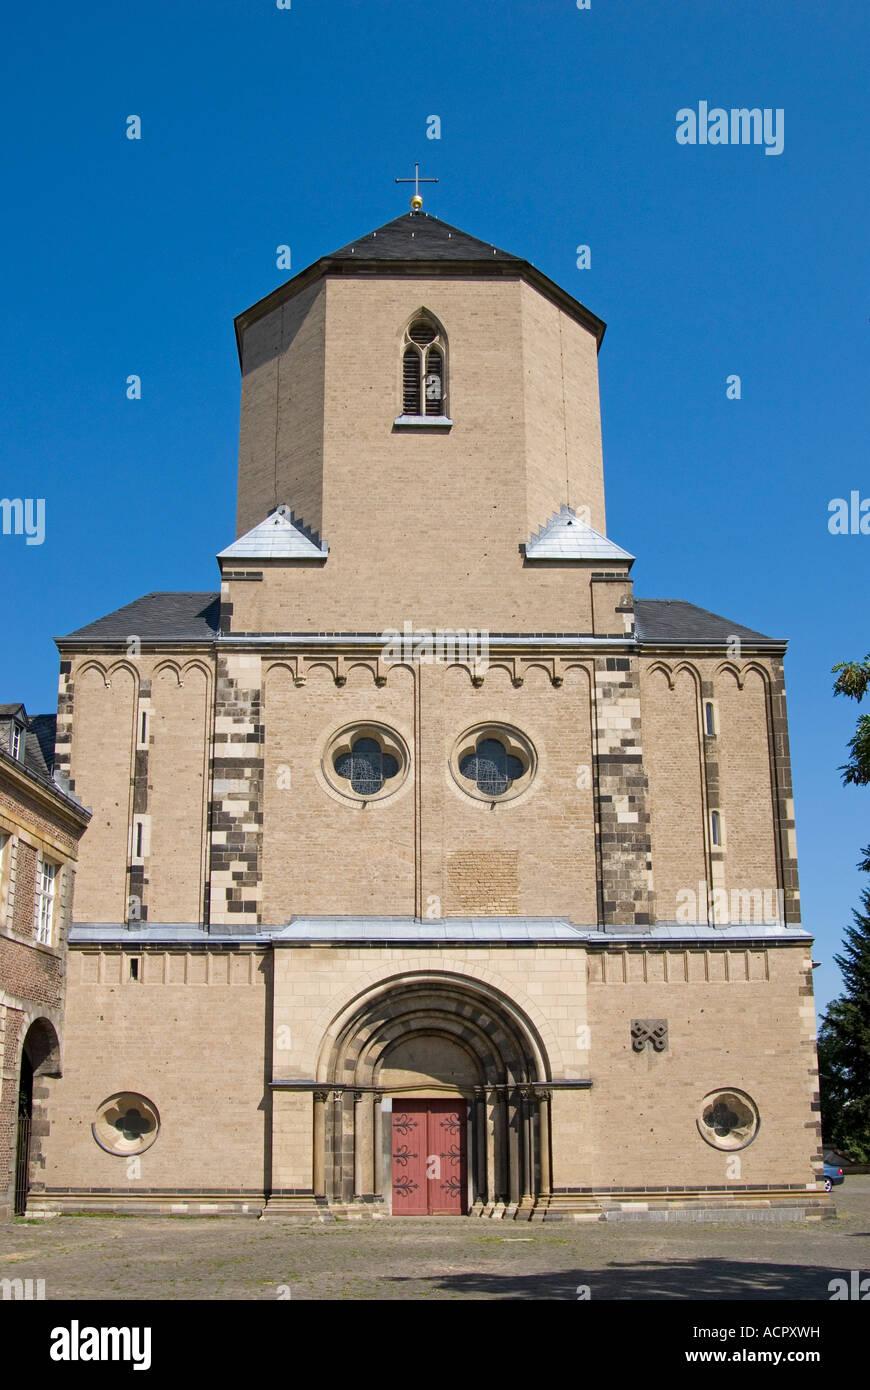 Moenchengladbach, North Rhein Westphalia, Germany. Munster (Benedictine Abbey; 13thC) - Stock Image